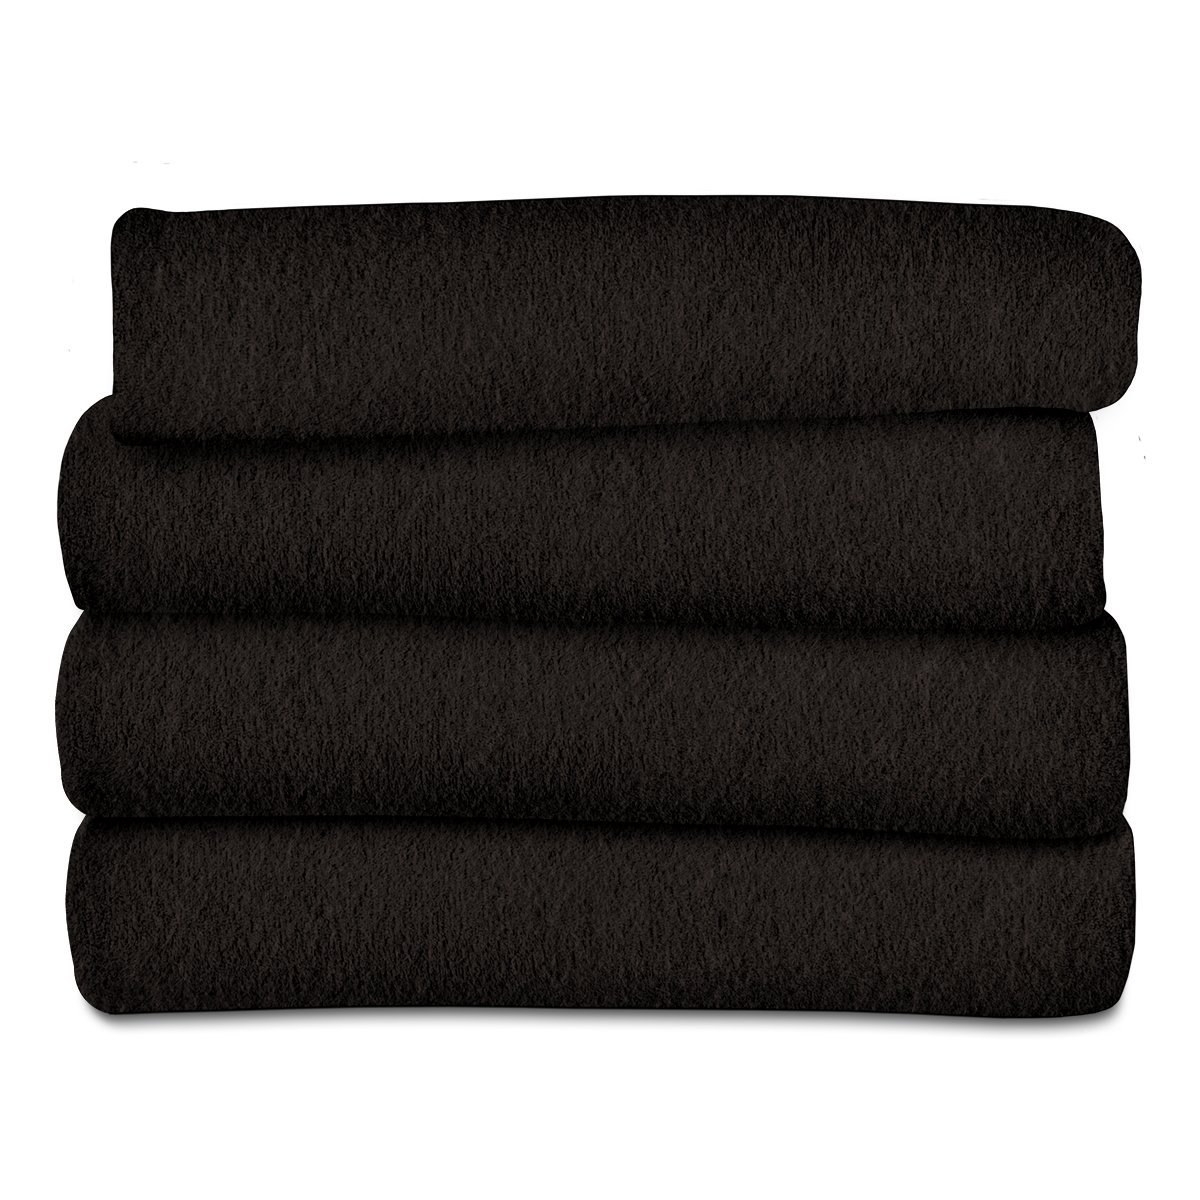 Sunbeam Heated Throw Blanket   Fleece, 3 Heat Settings, Walnut